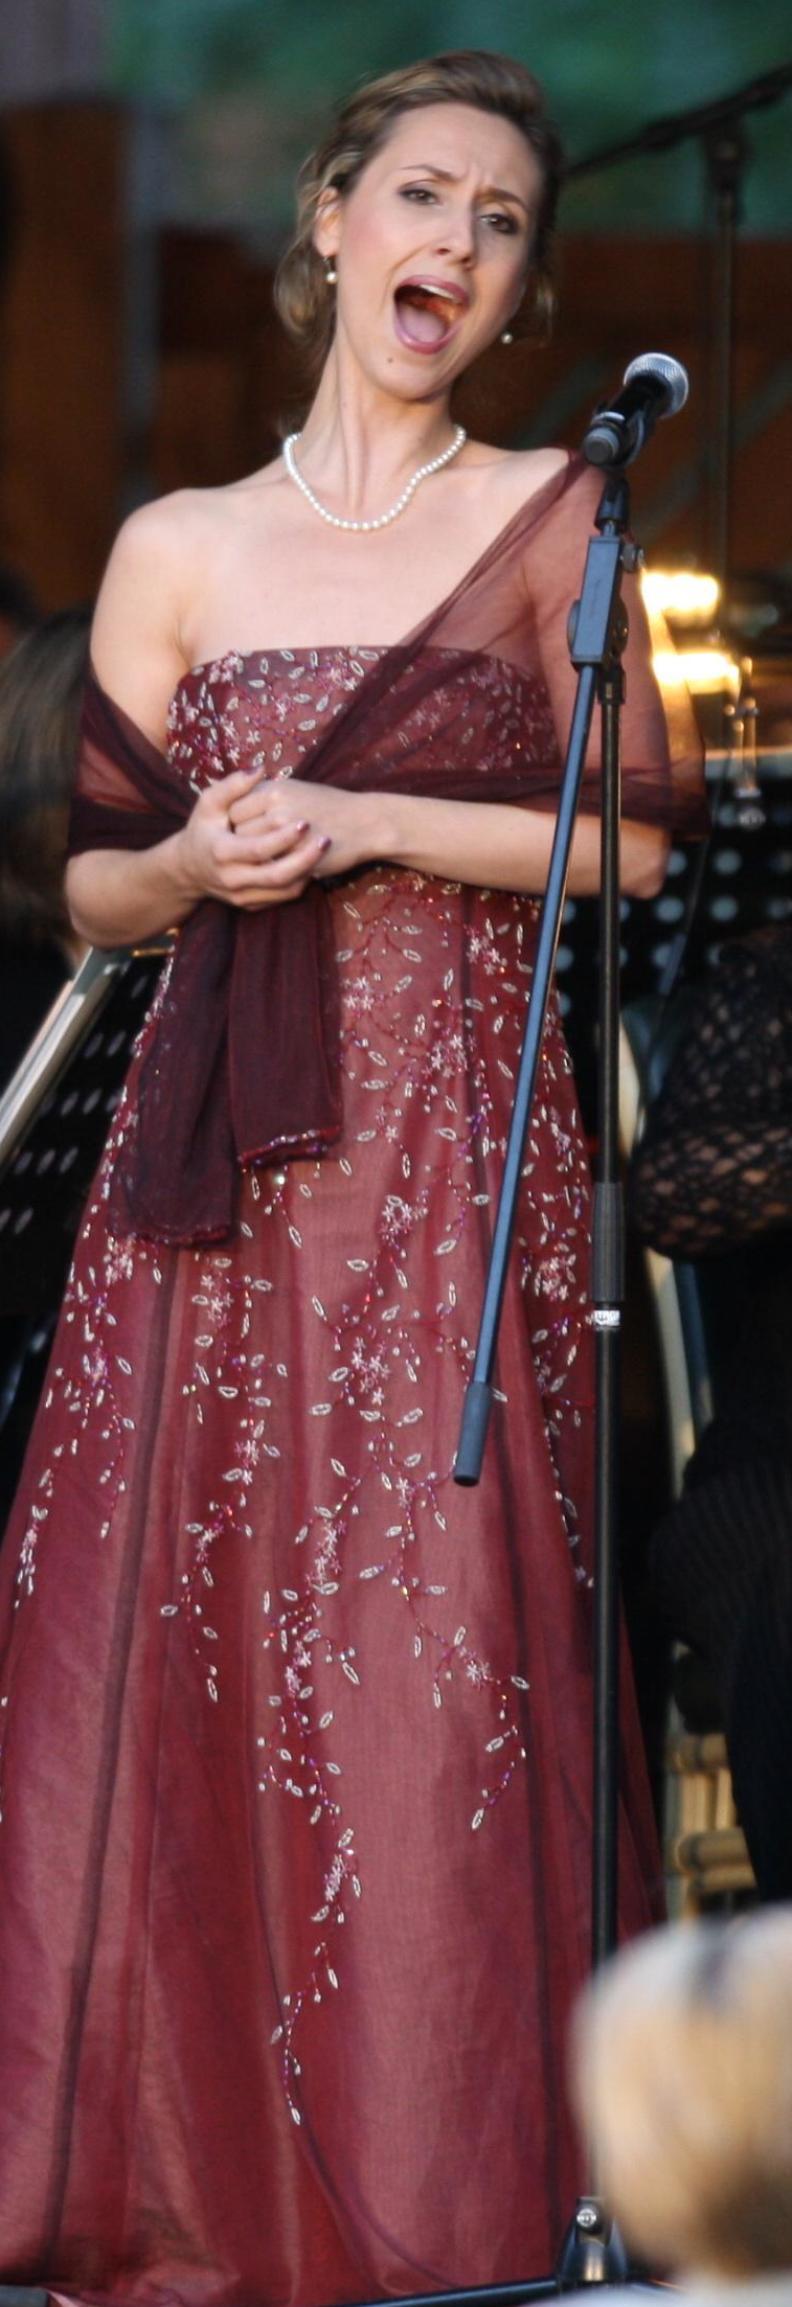 Katja Bördner, OpenAir-Opern-Gala